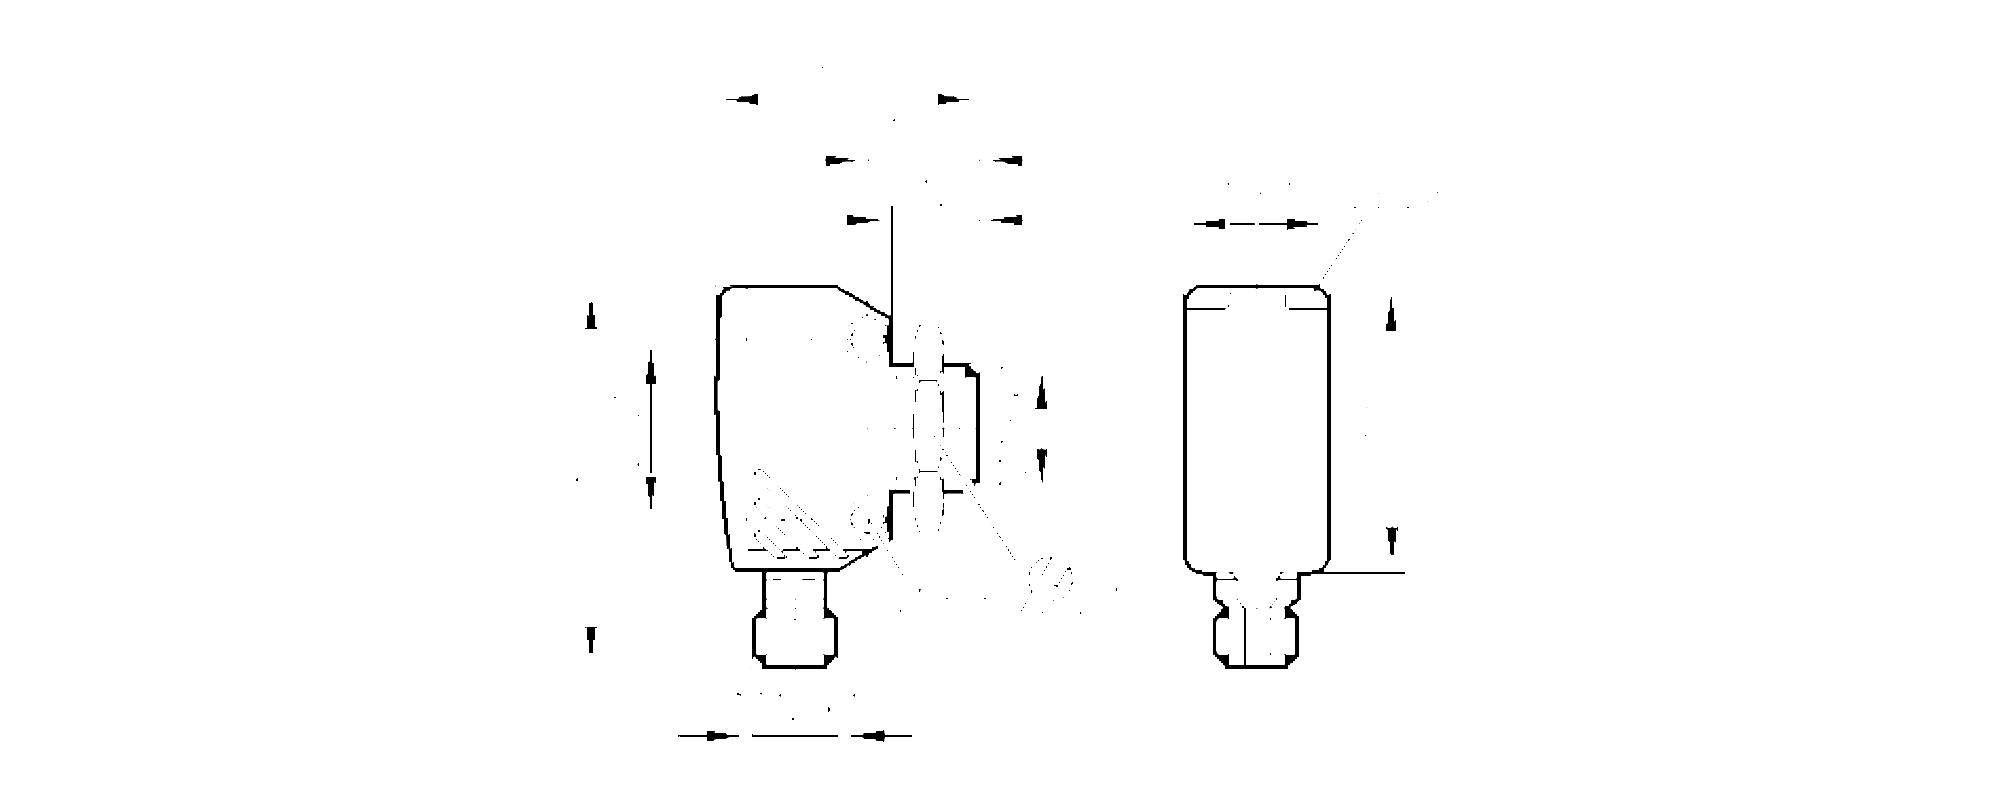 ogp281 - retro-reflective sensor